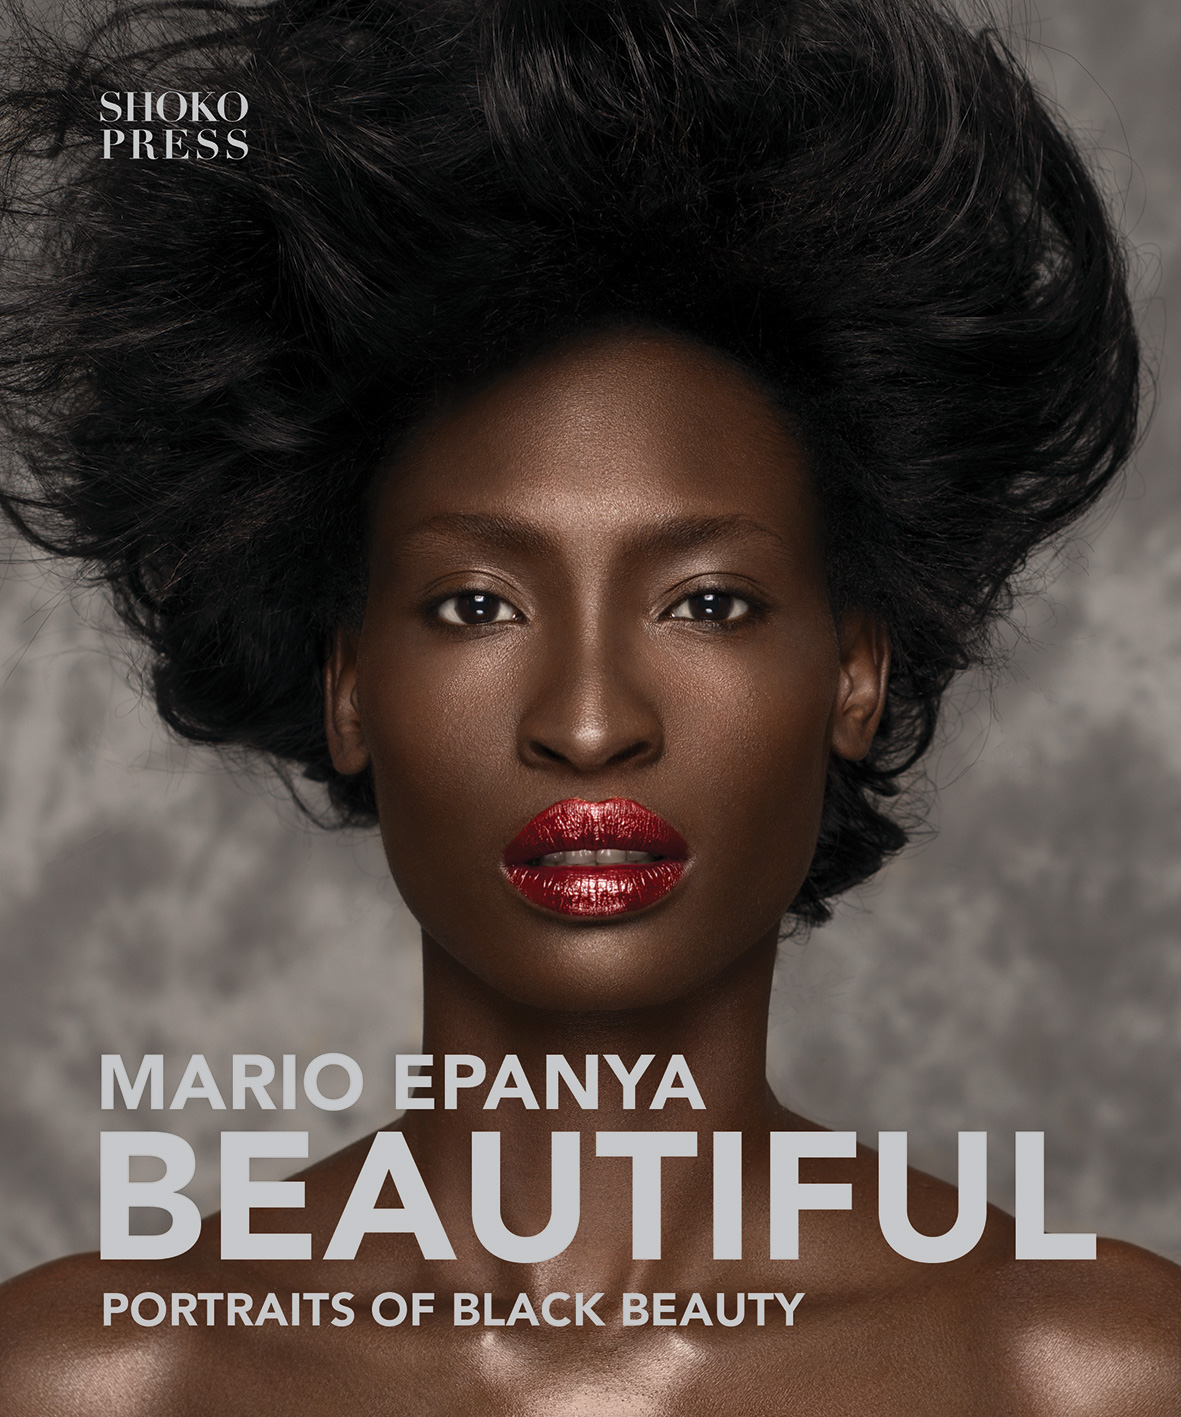 BEAUTIFUL portraits of Black Beauty by photographer Mario Epanya